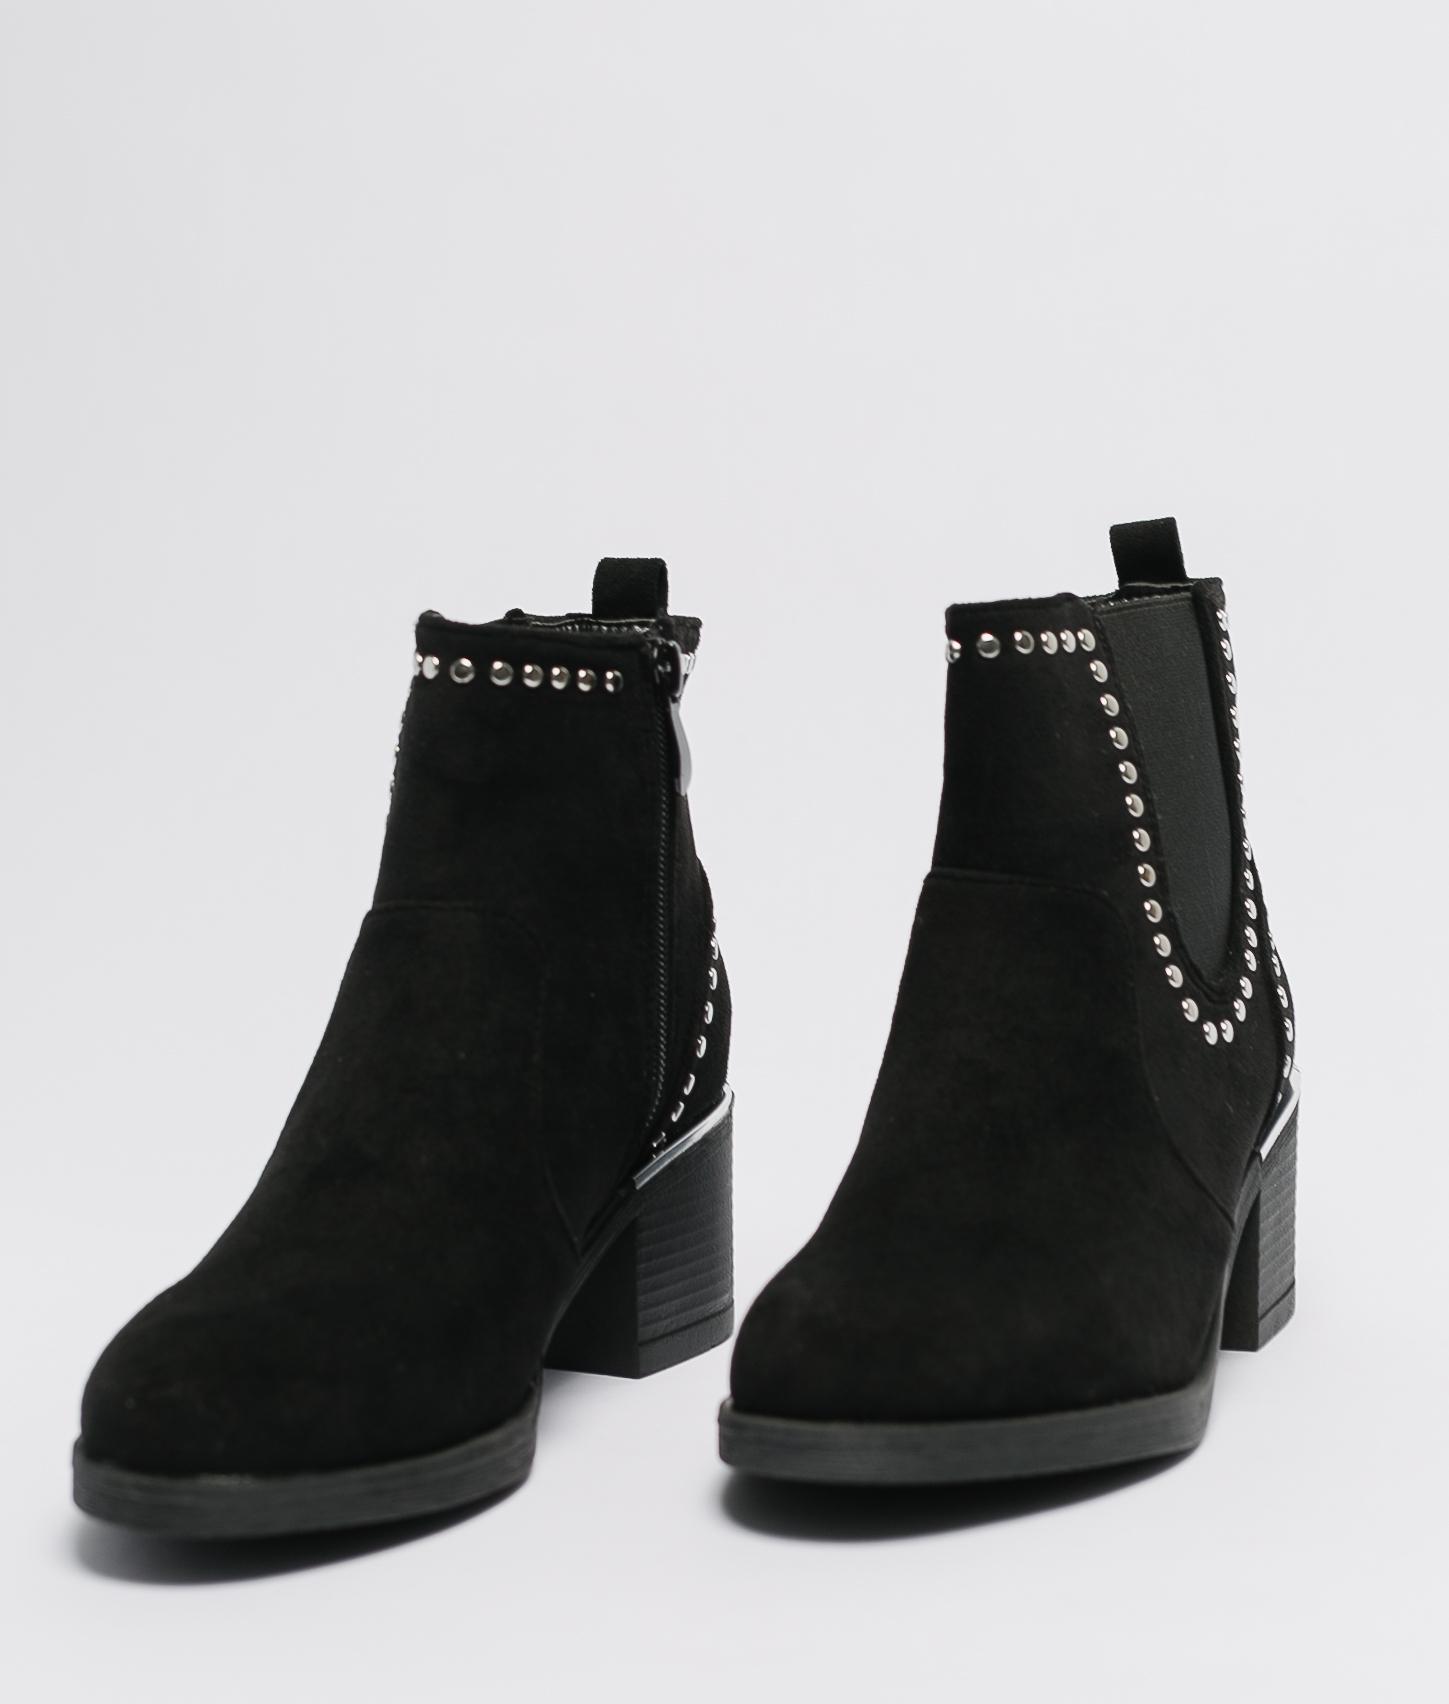 Bota Petite Cabany - Noir